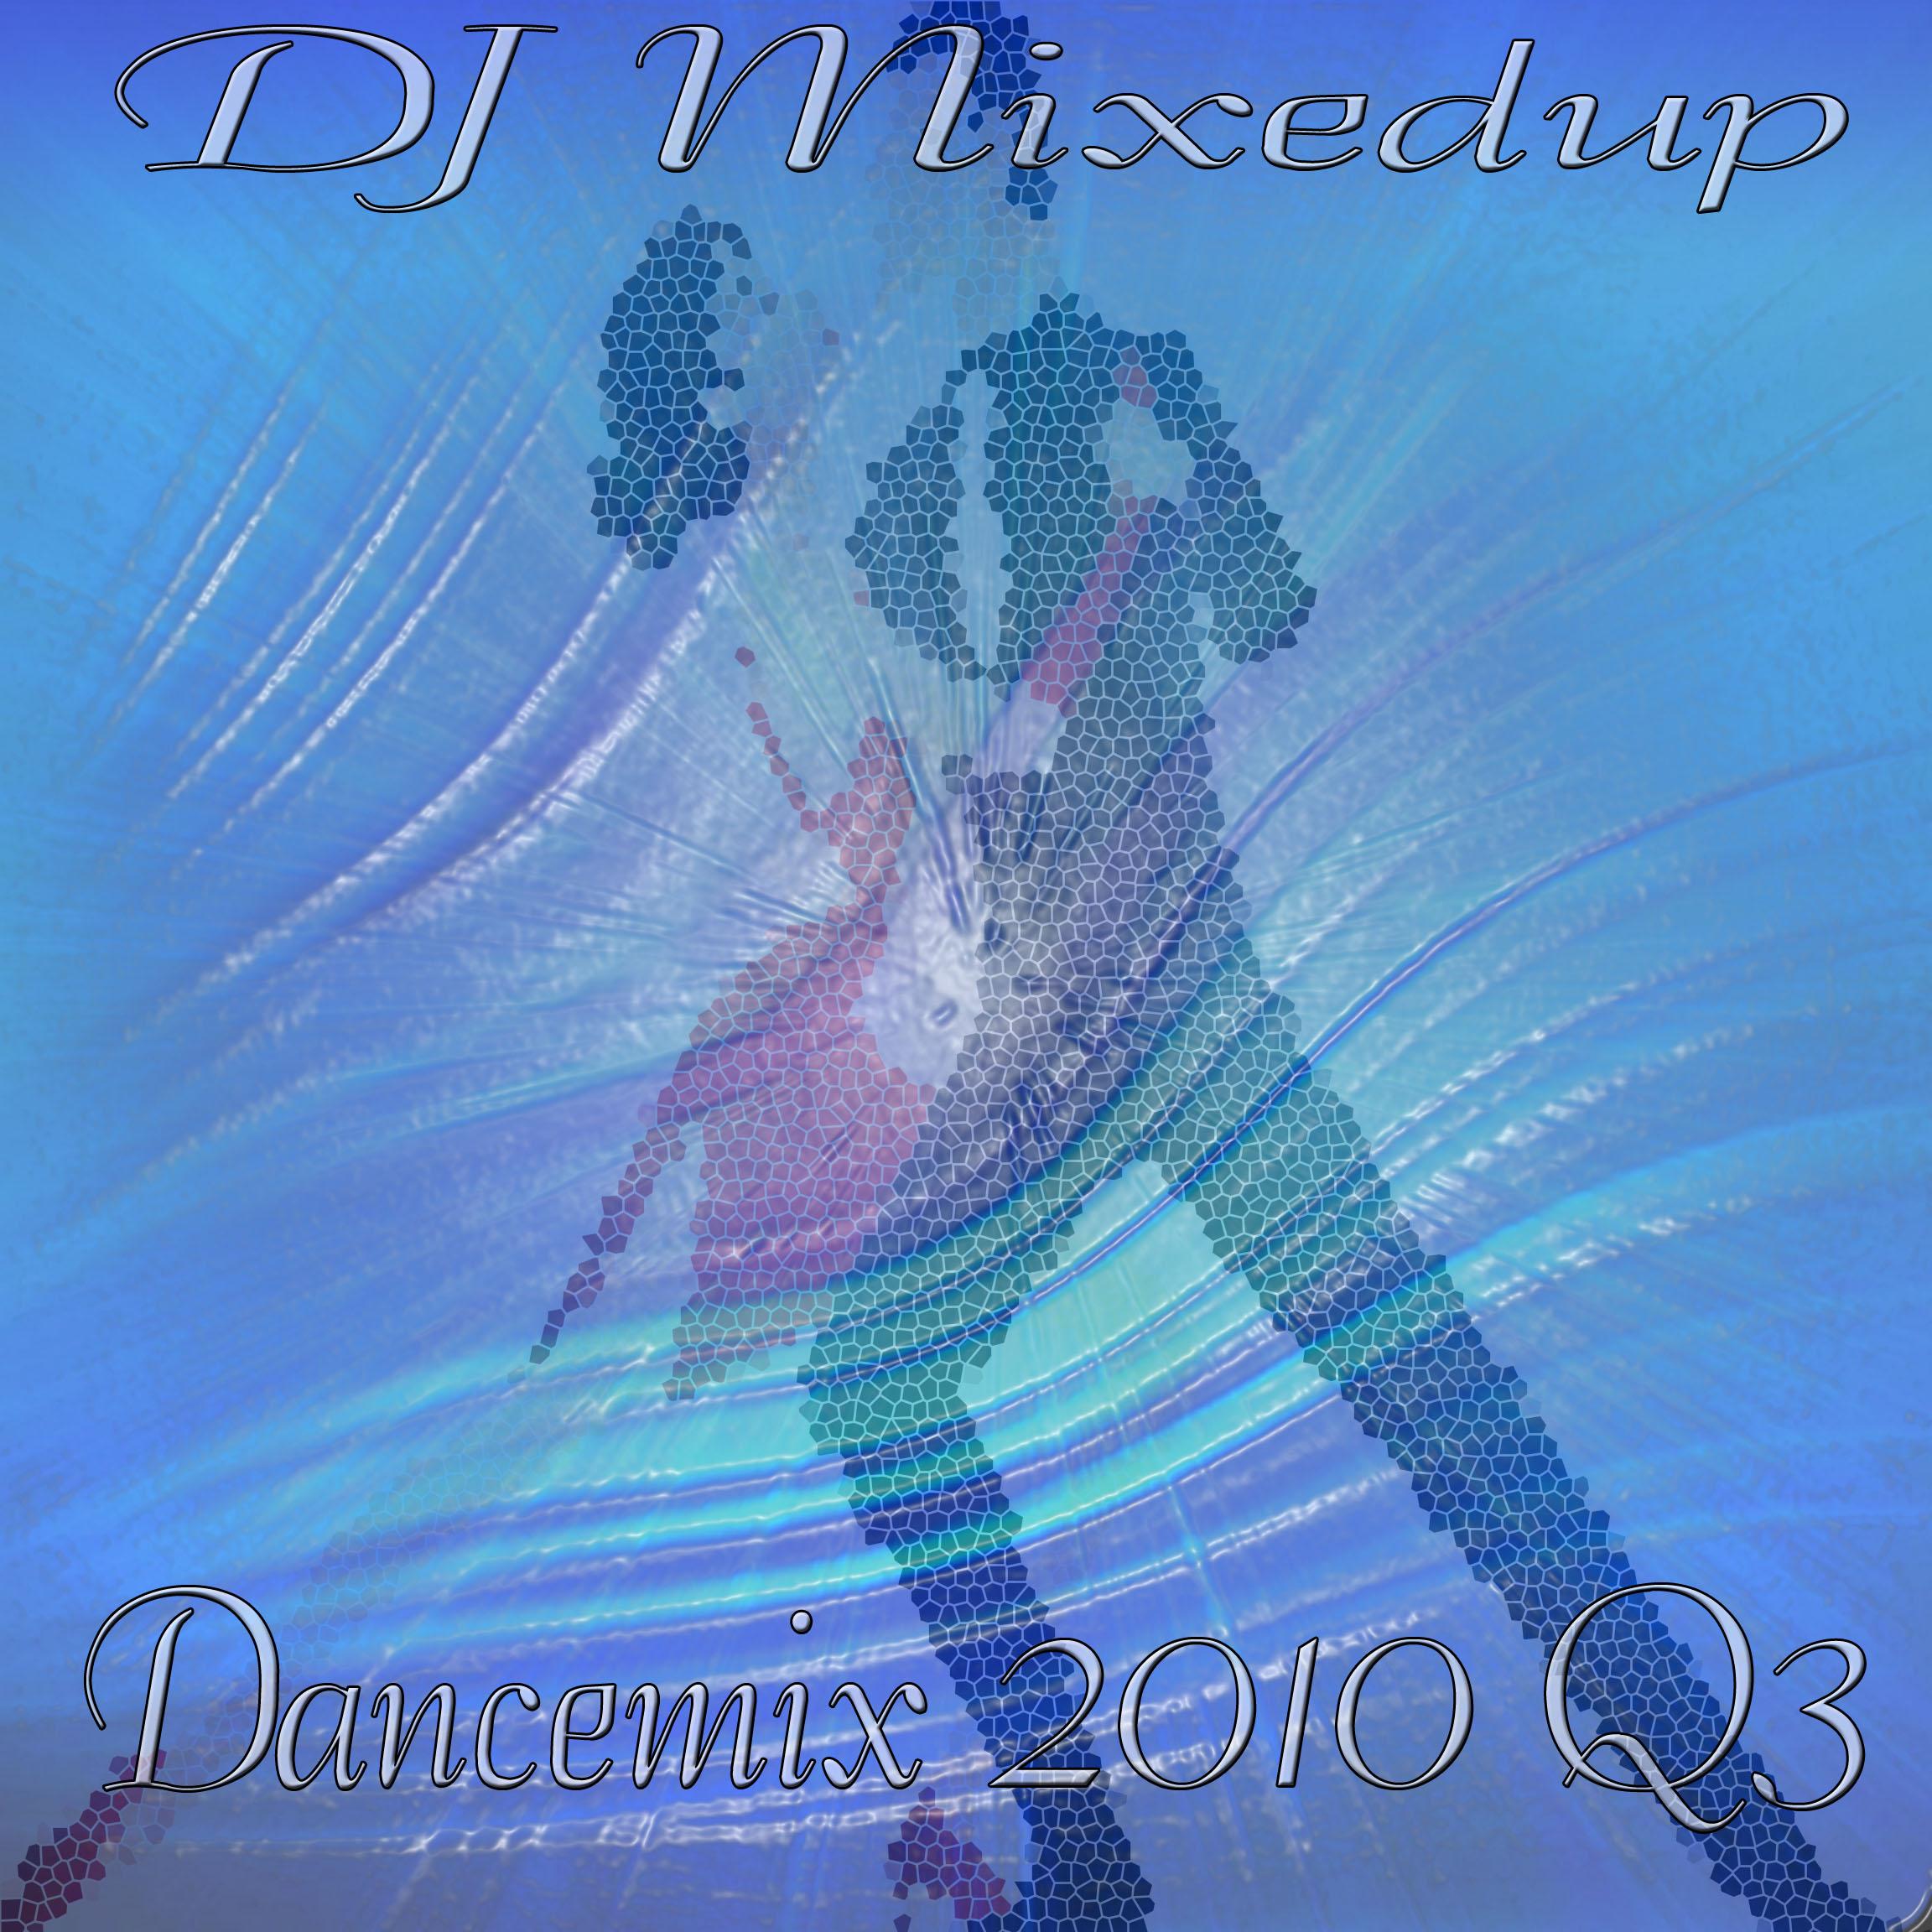 Dj Mixedup - Dancemix 2010 Q3 - 2 Disc